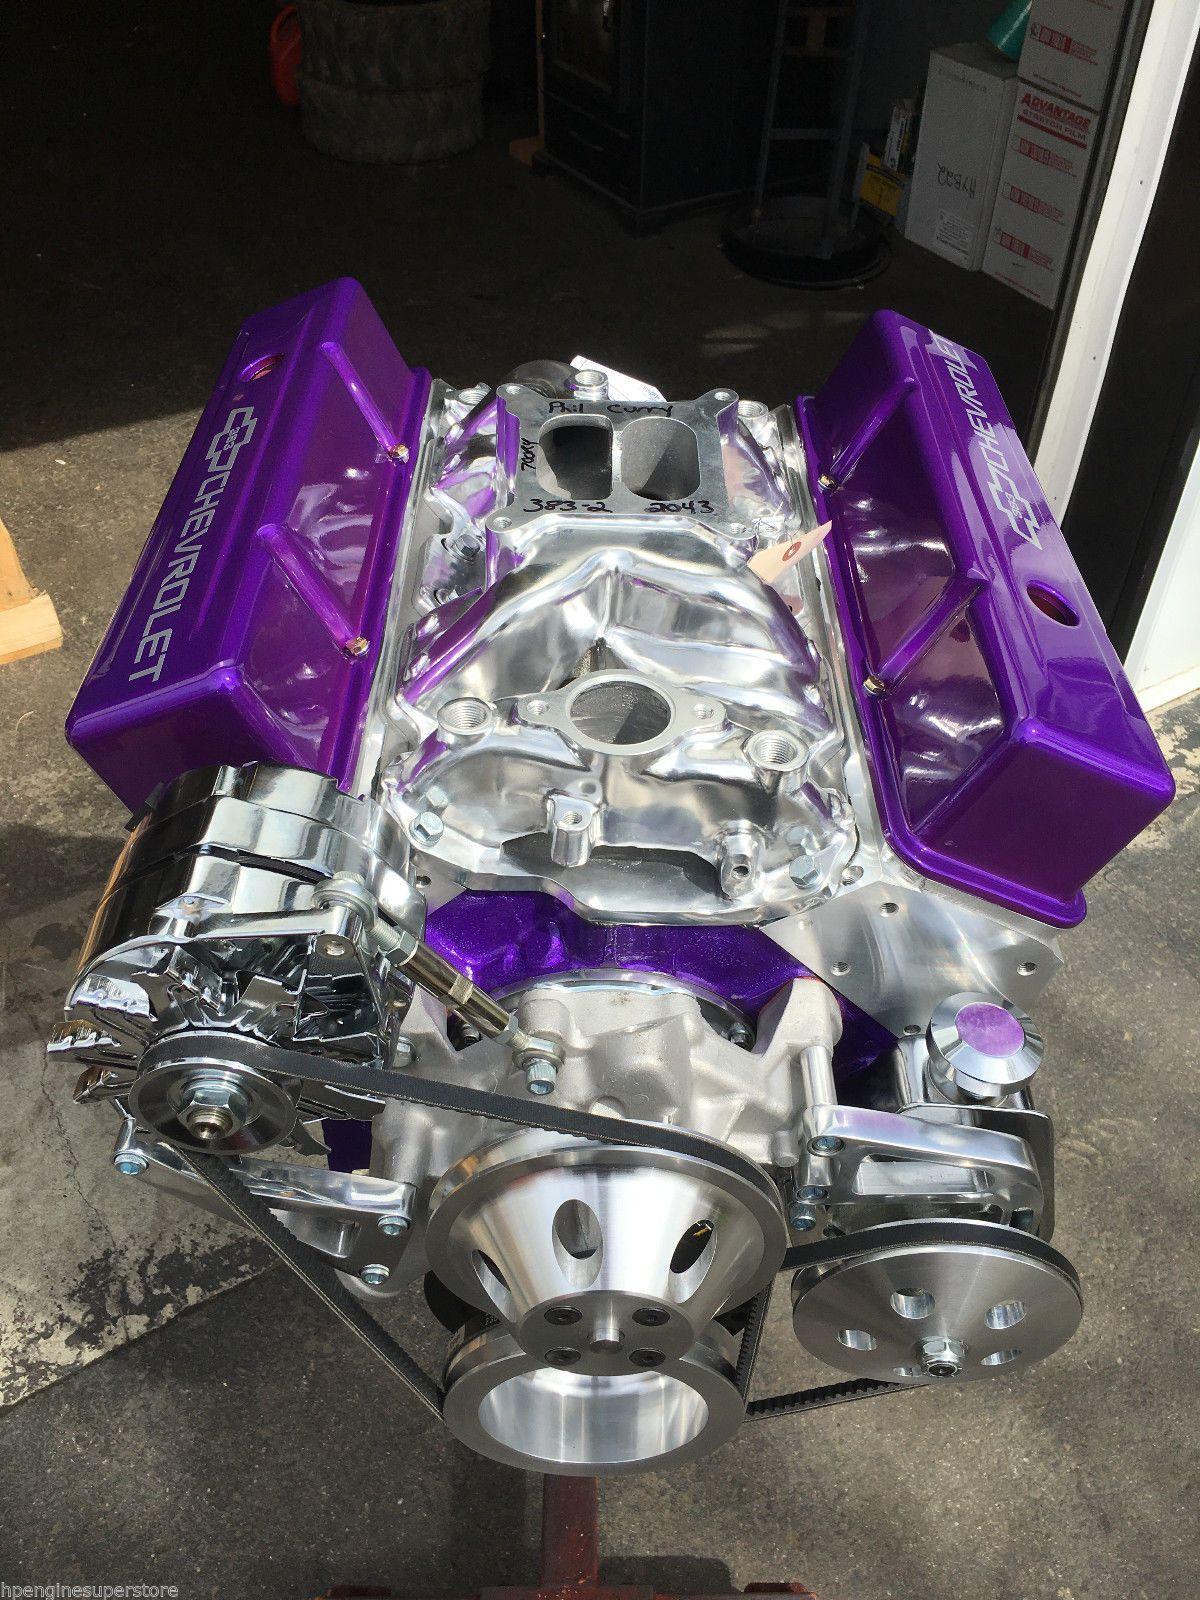 383 stroker motor 465hp roller turn key pro street chevy crate